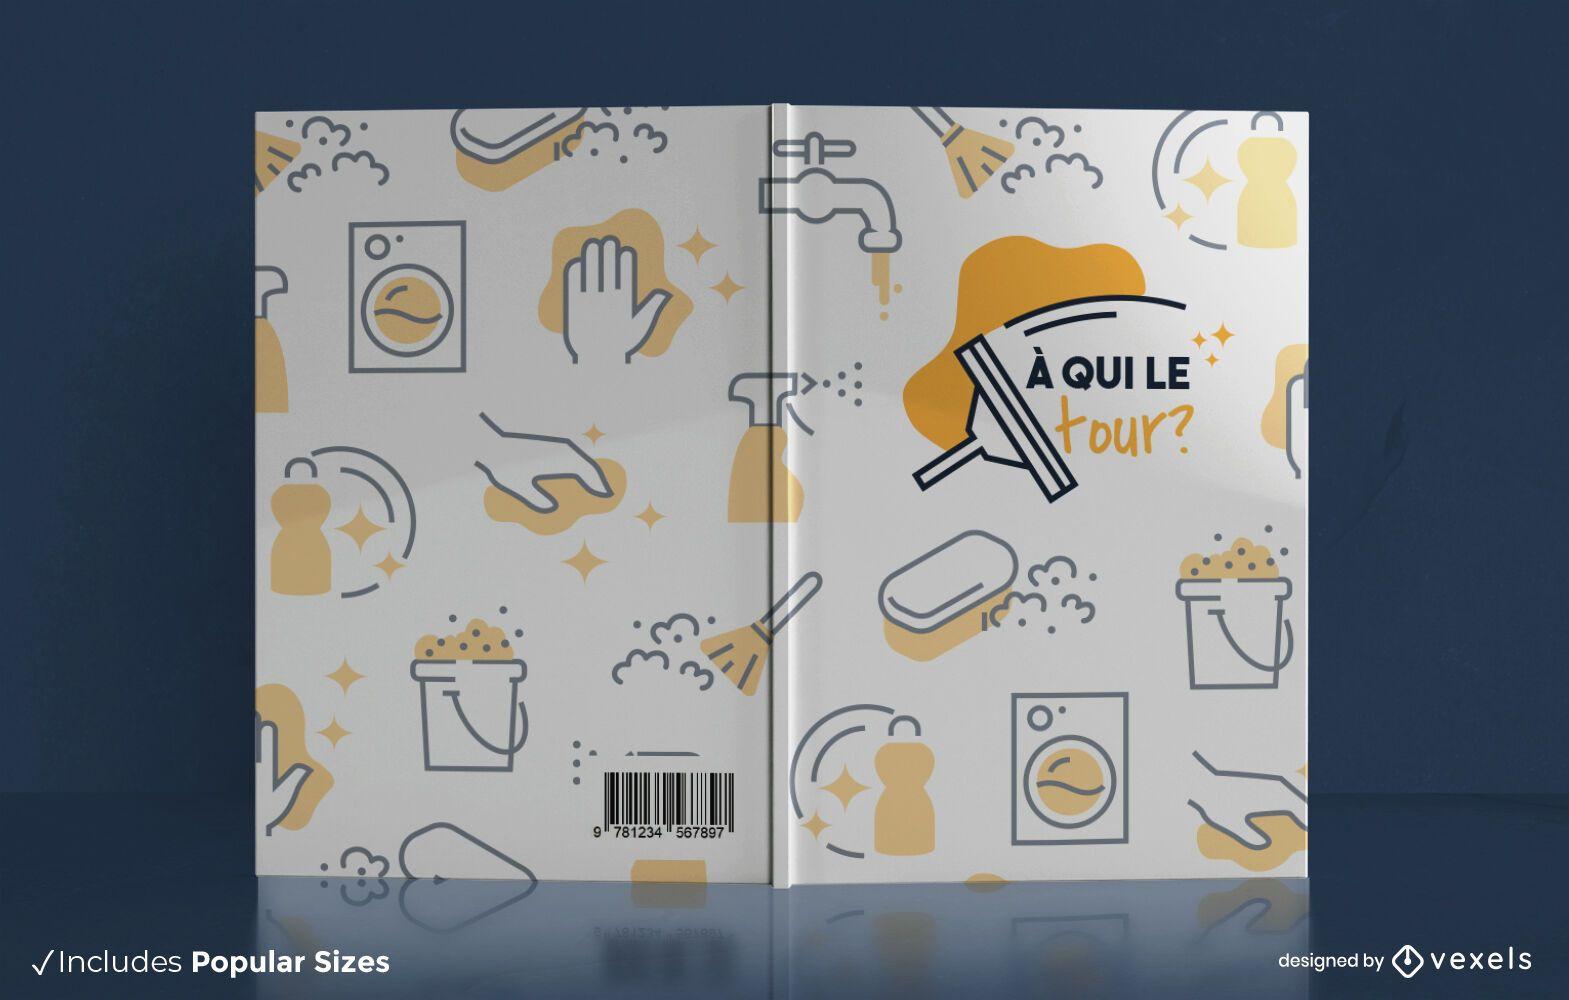 Diseño de portada de libro de tareas domésticas.